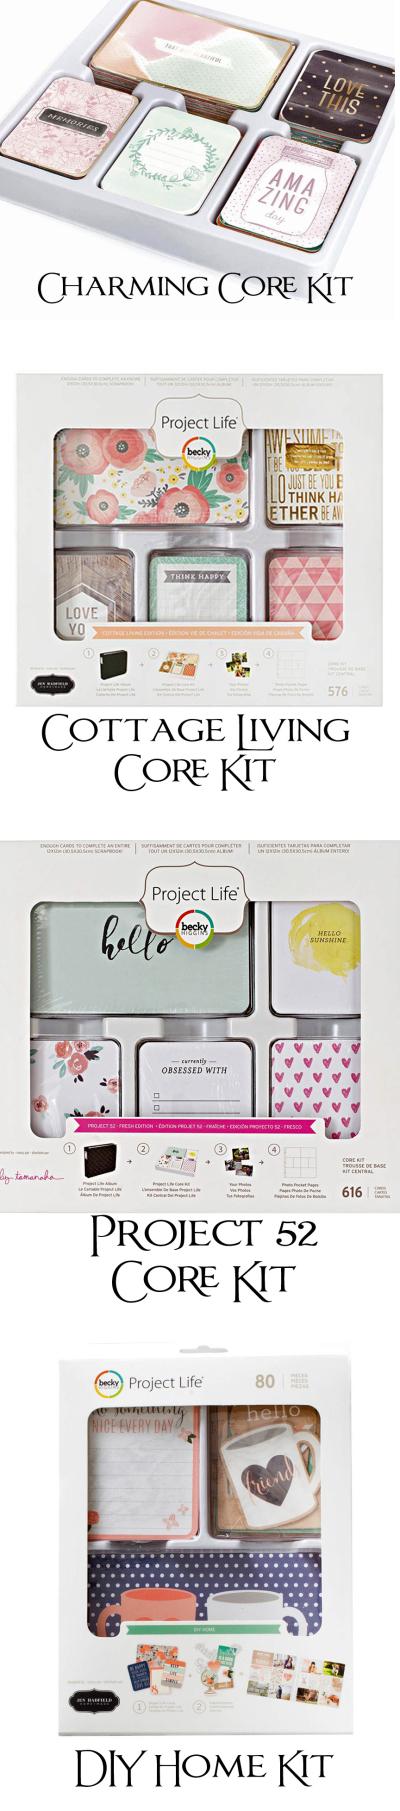 Core Kits